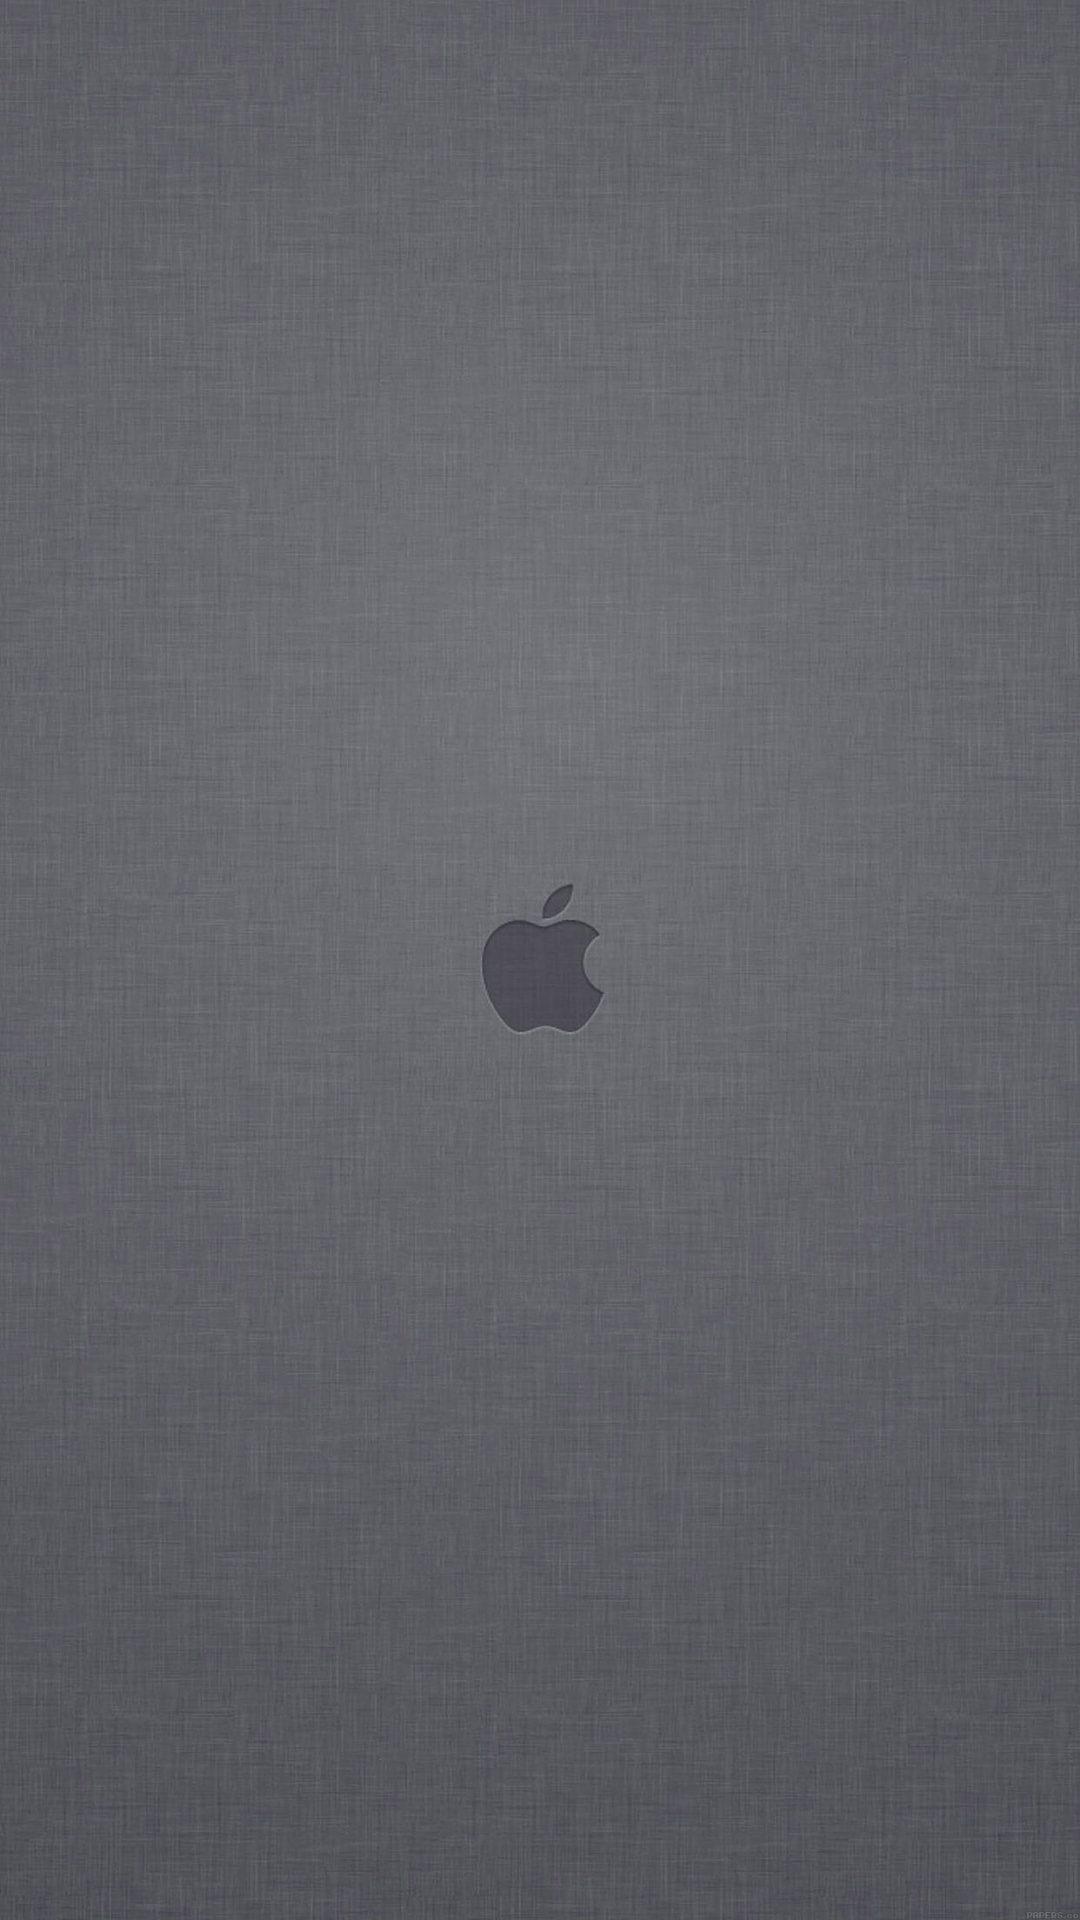 Wallpaper Tiny Apple Logo